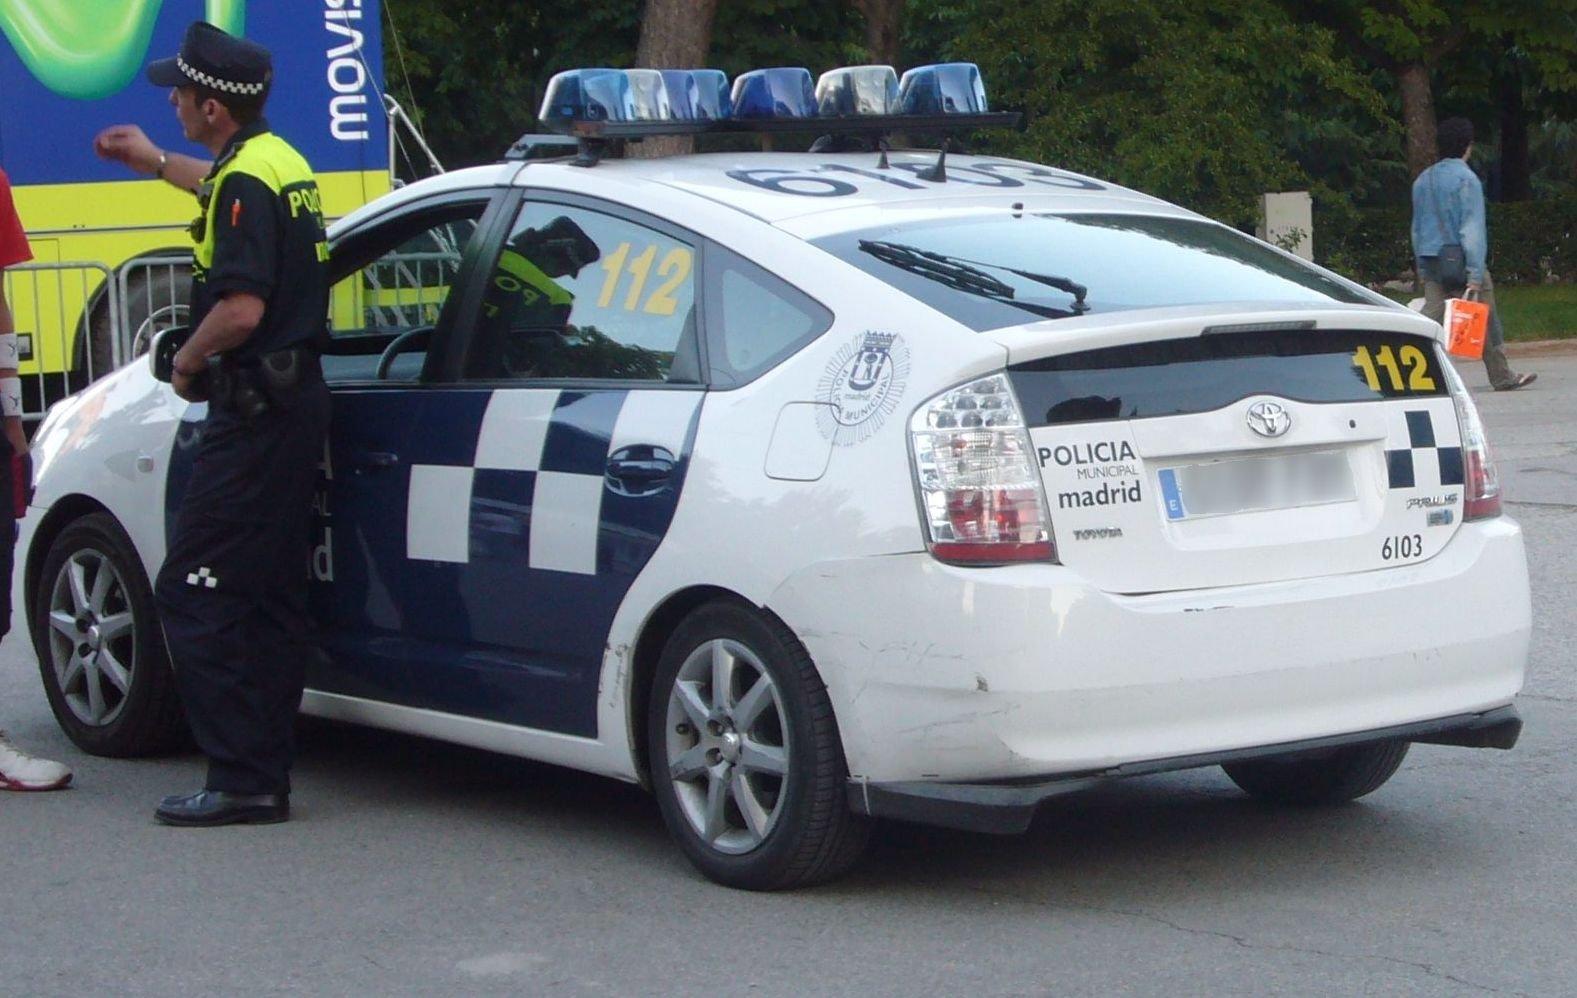 Prius como coche de policía municipal